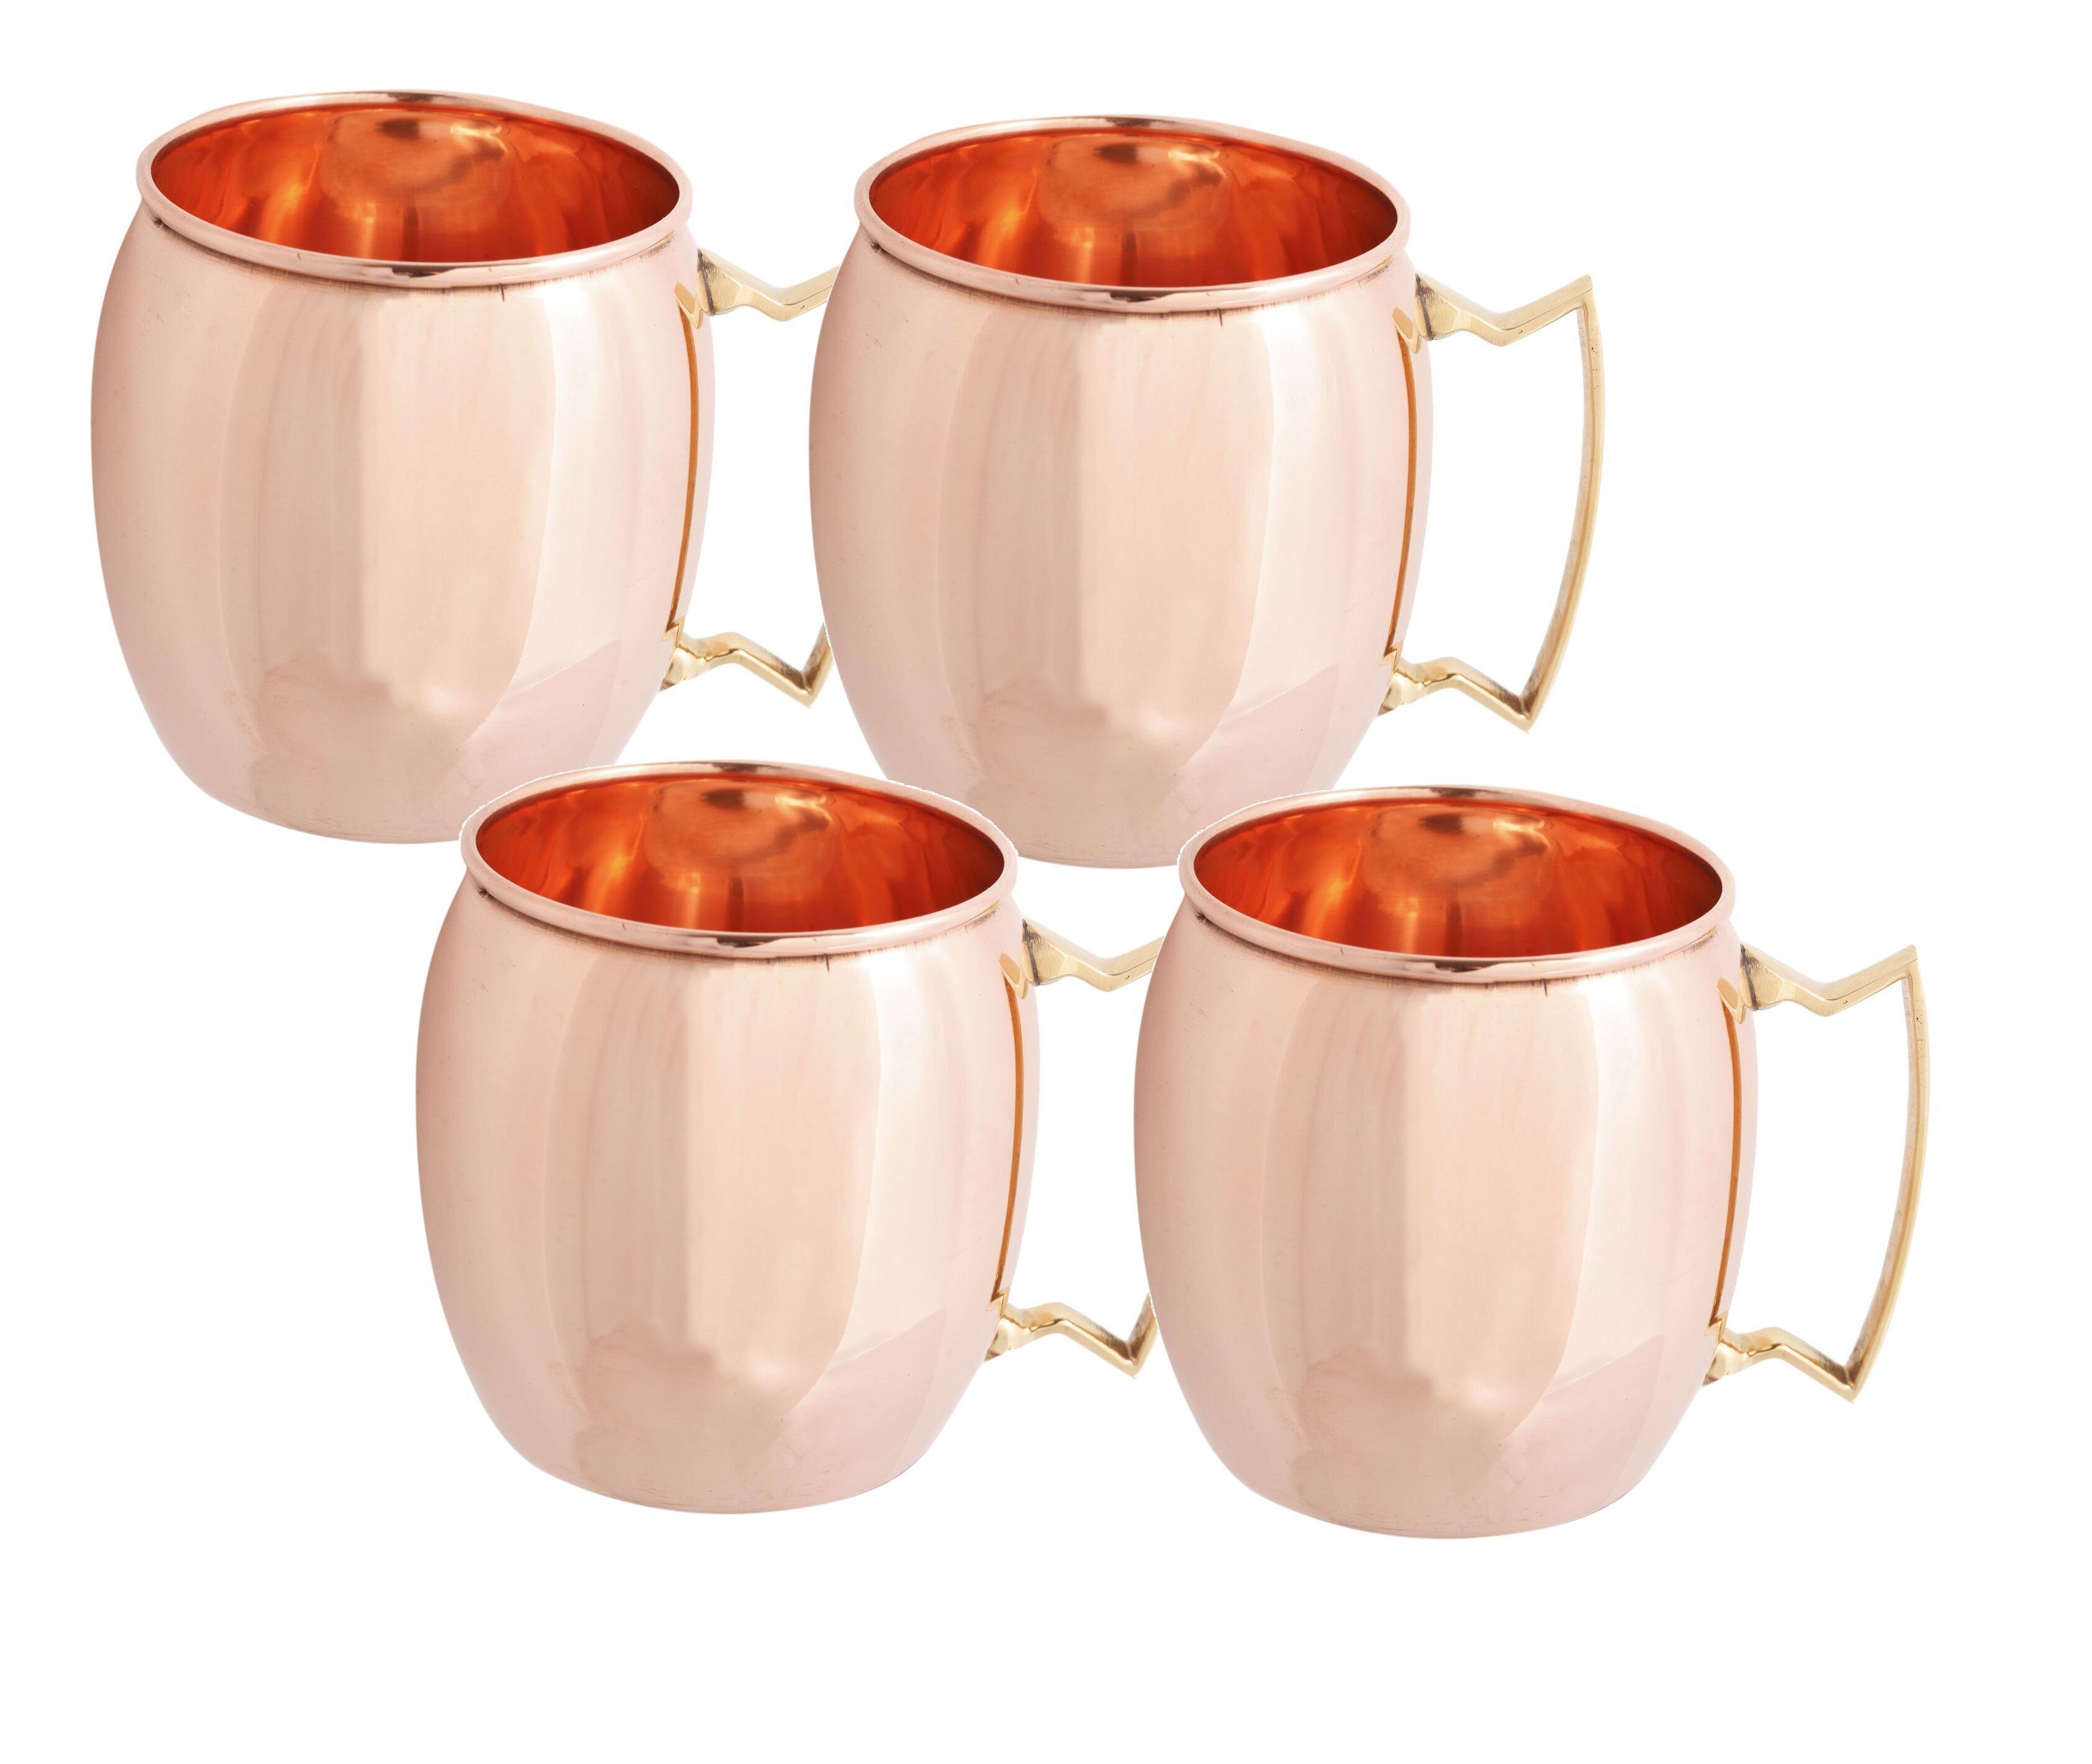 Moscow Mule Copper Mugs | Wayfair